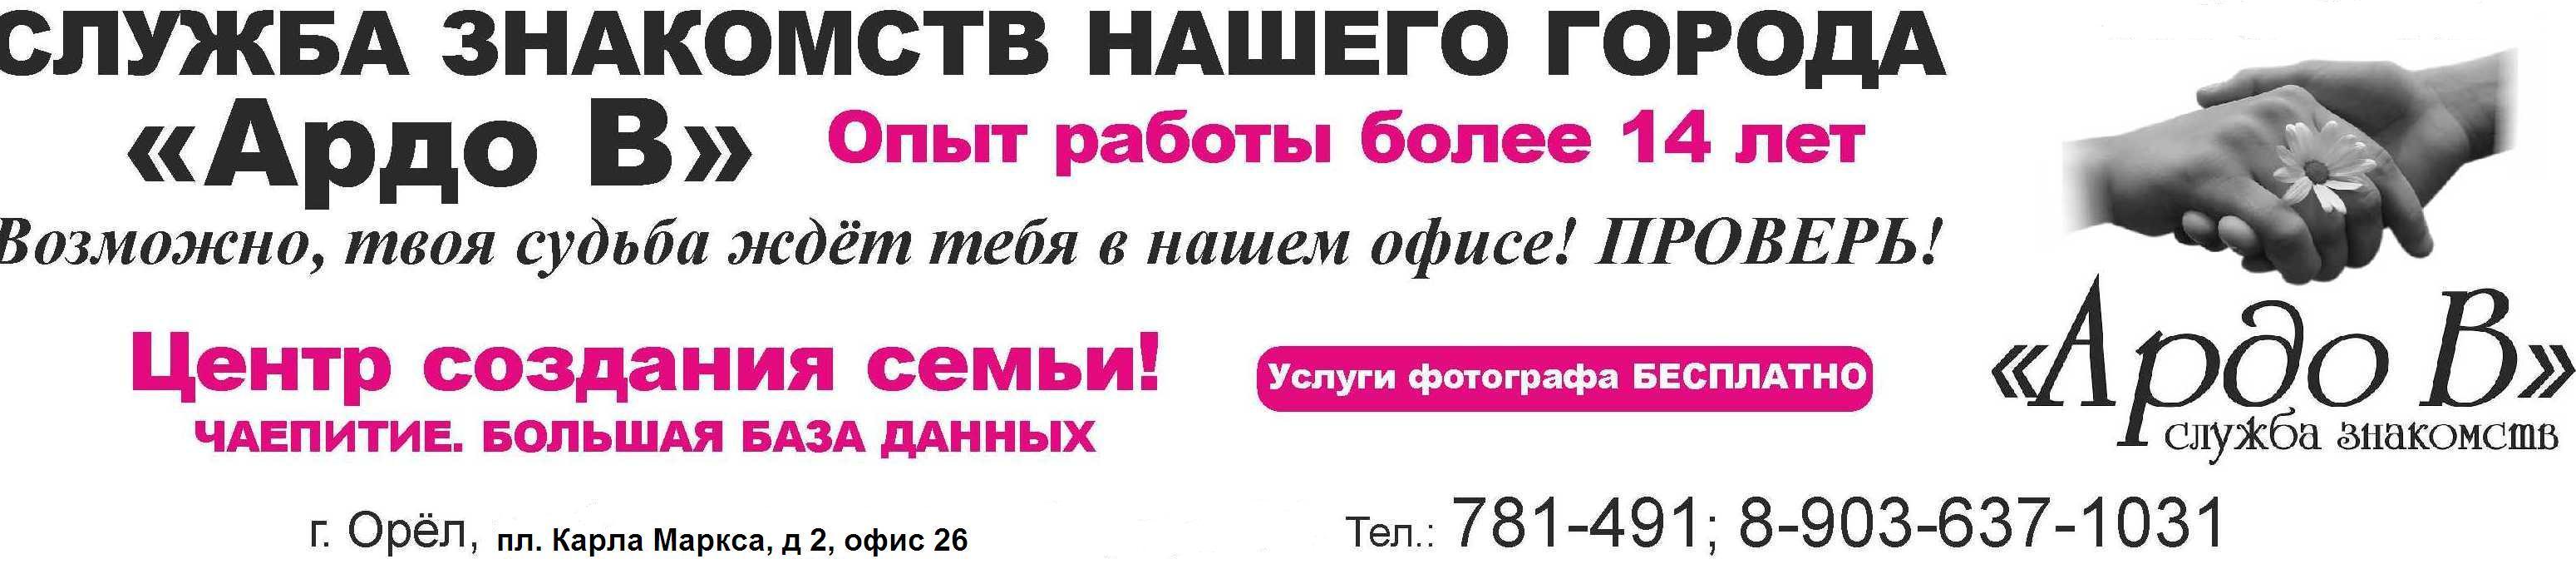 Екатеринбургский сайт знакомств